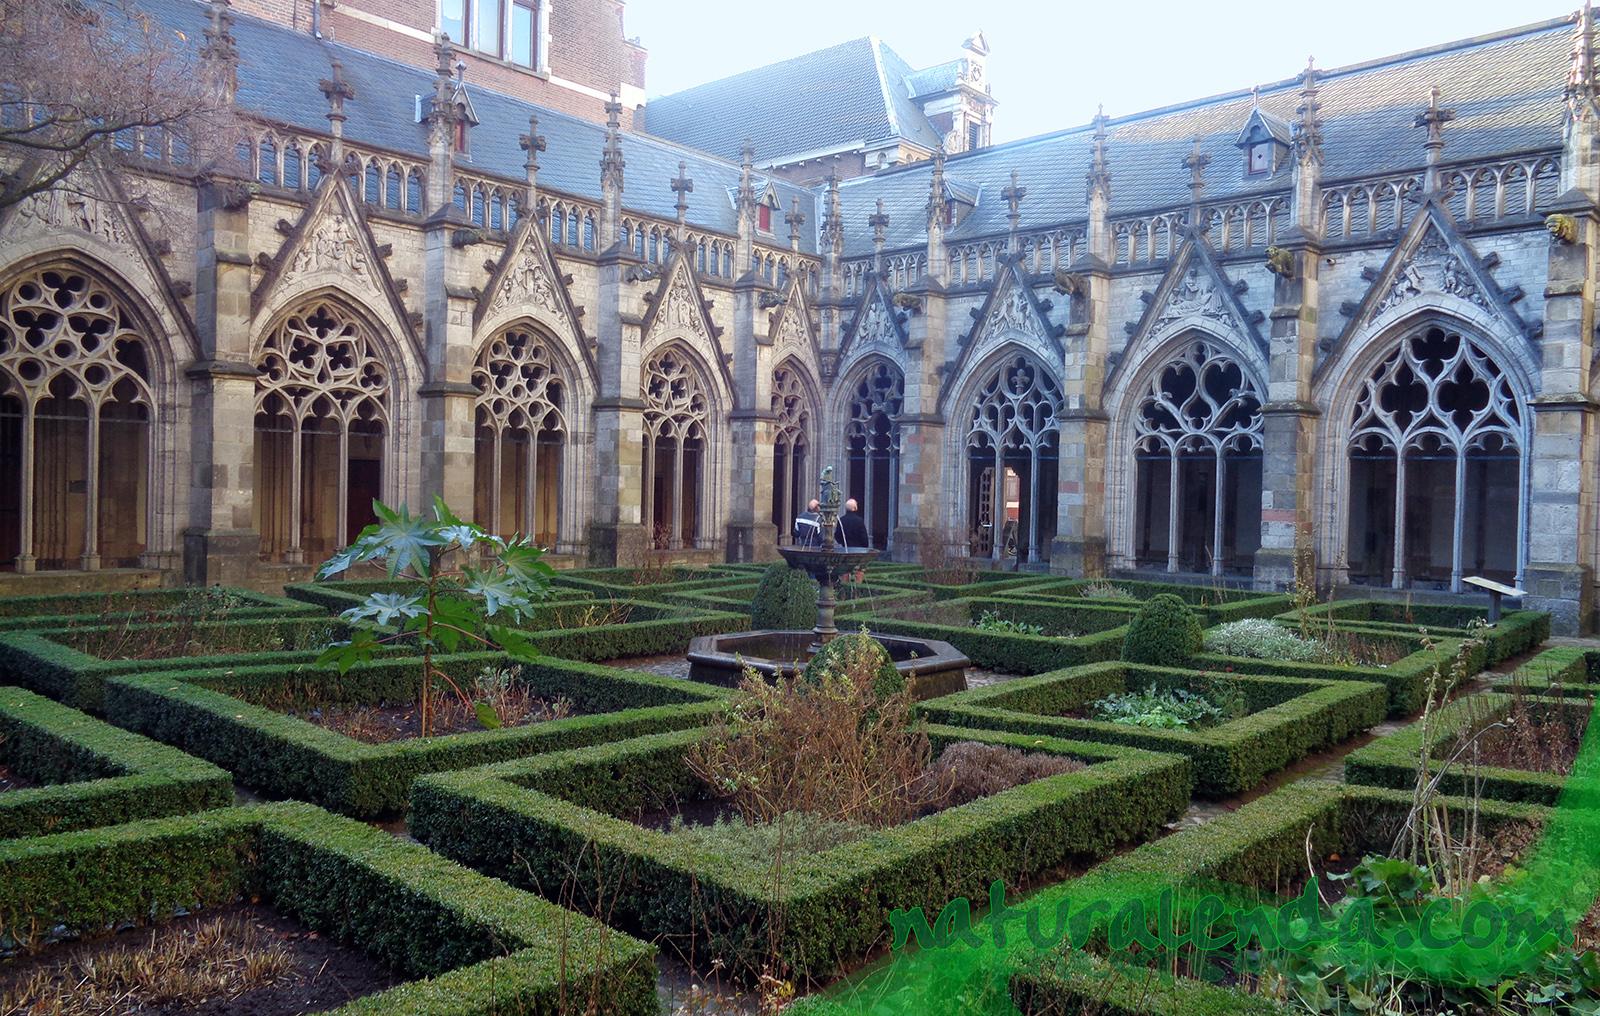 claustro de la catedral de Utrecht